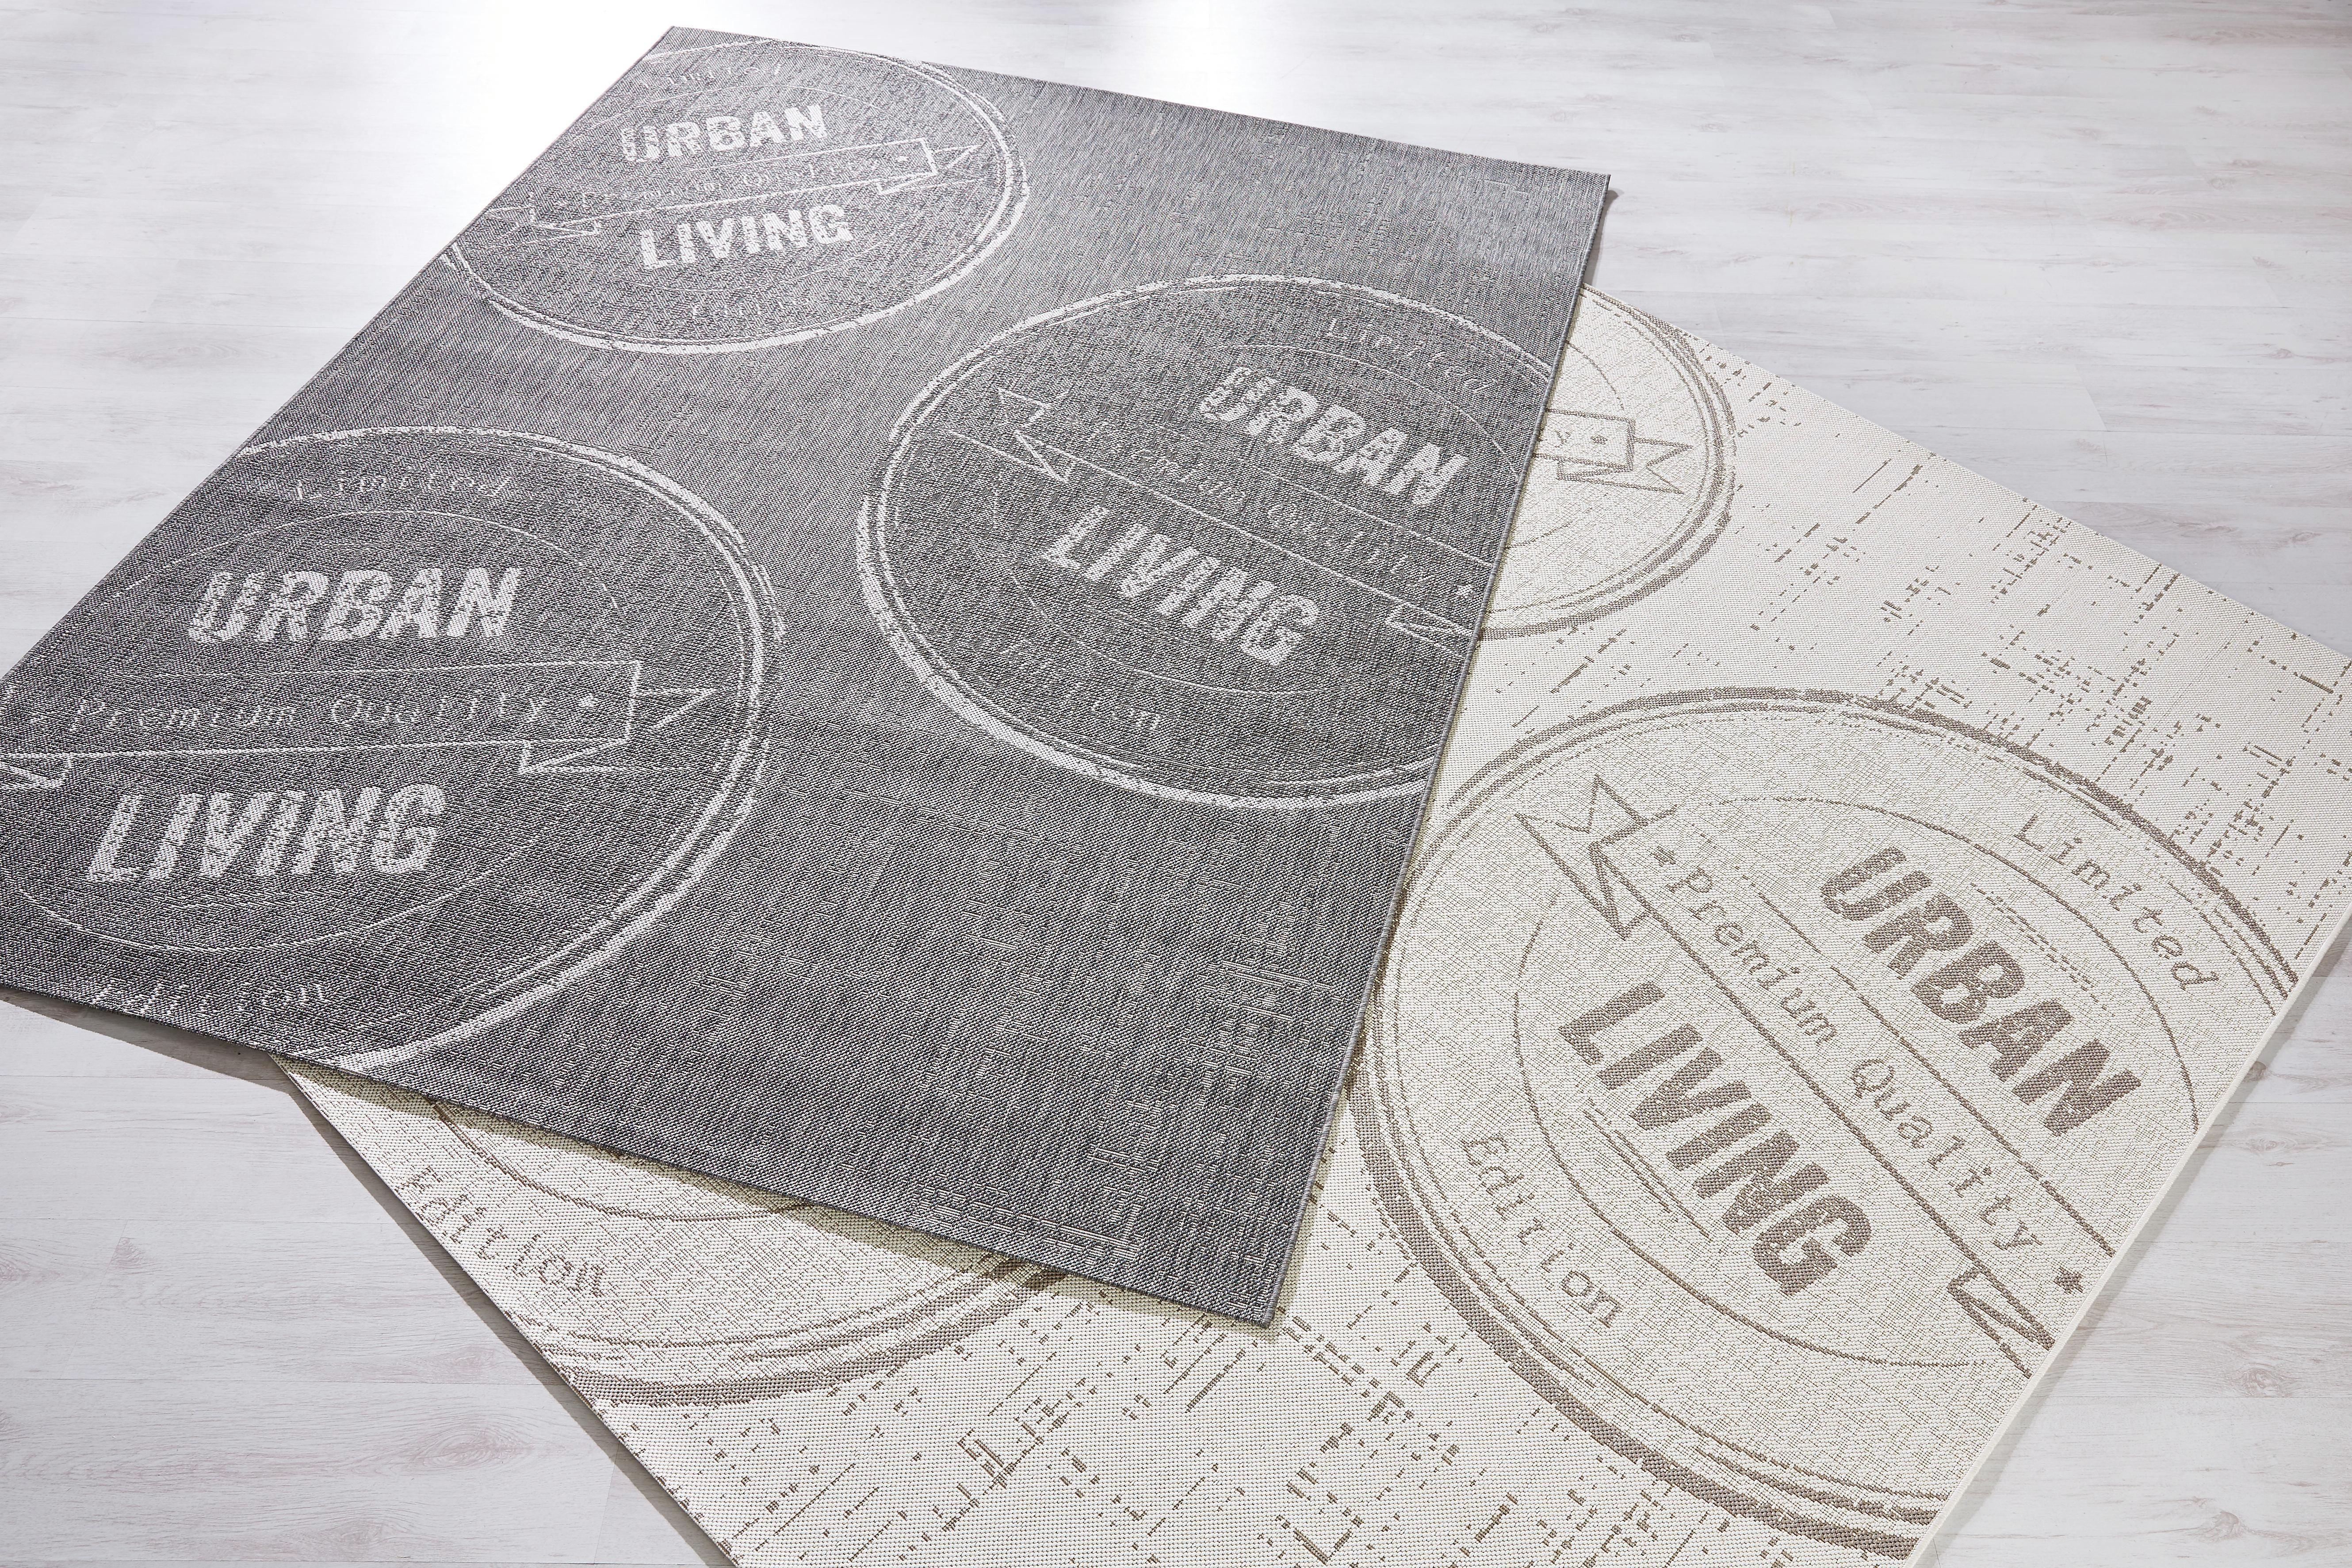 Síkszövet Szőnyeg Urban Living 2 - antracit, Lifestyle (120/170cm) - MÖMAX modern living